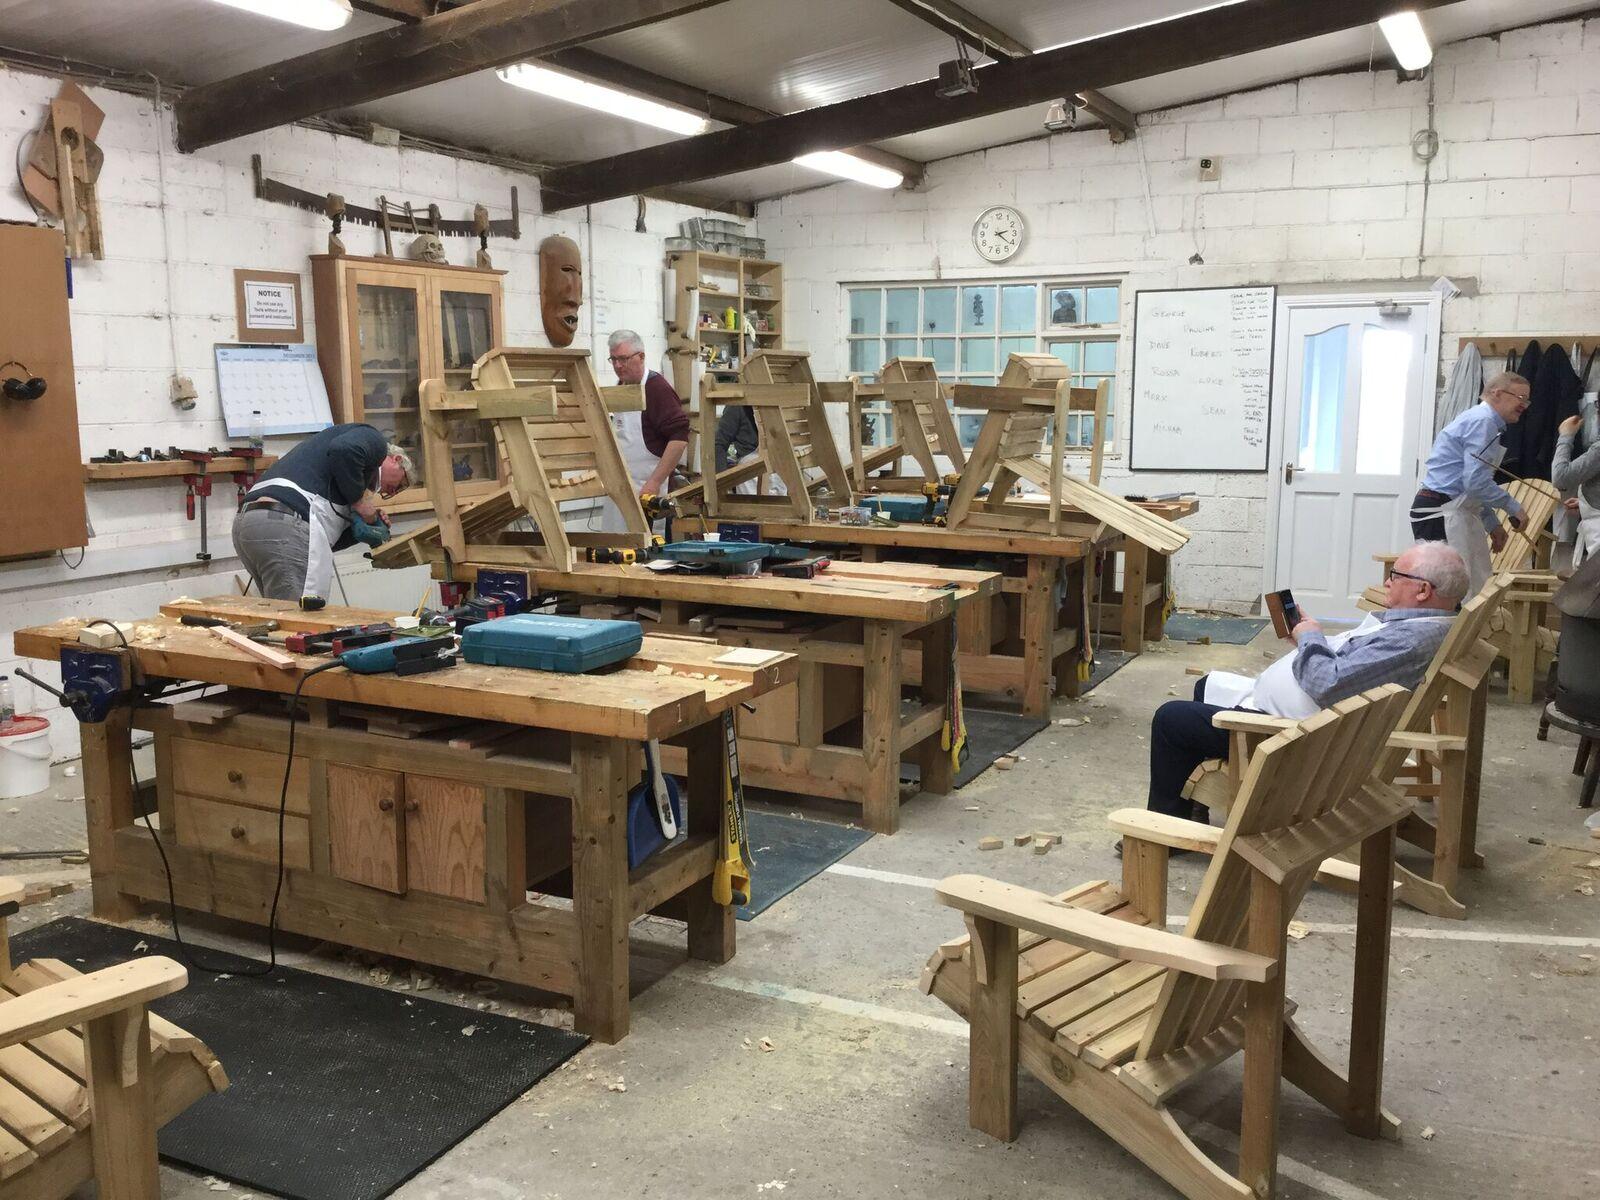 adirondack chair group - bevel woodworking school